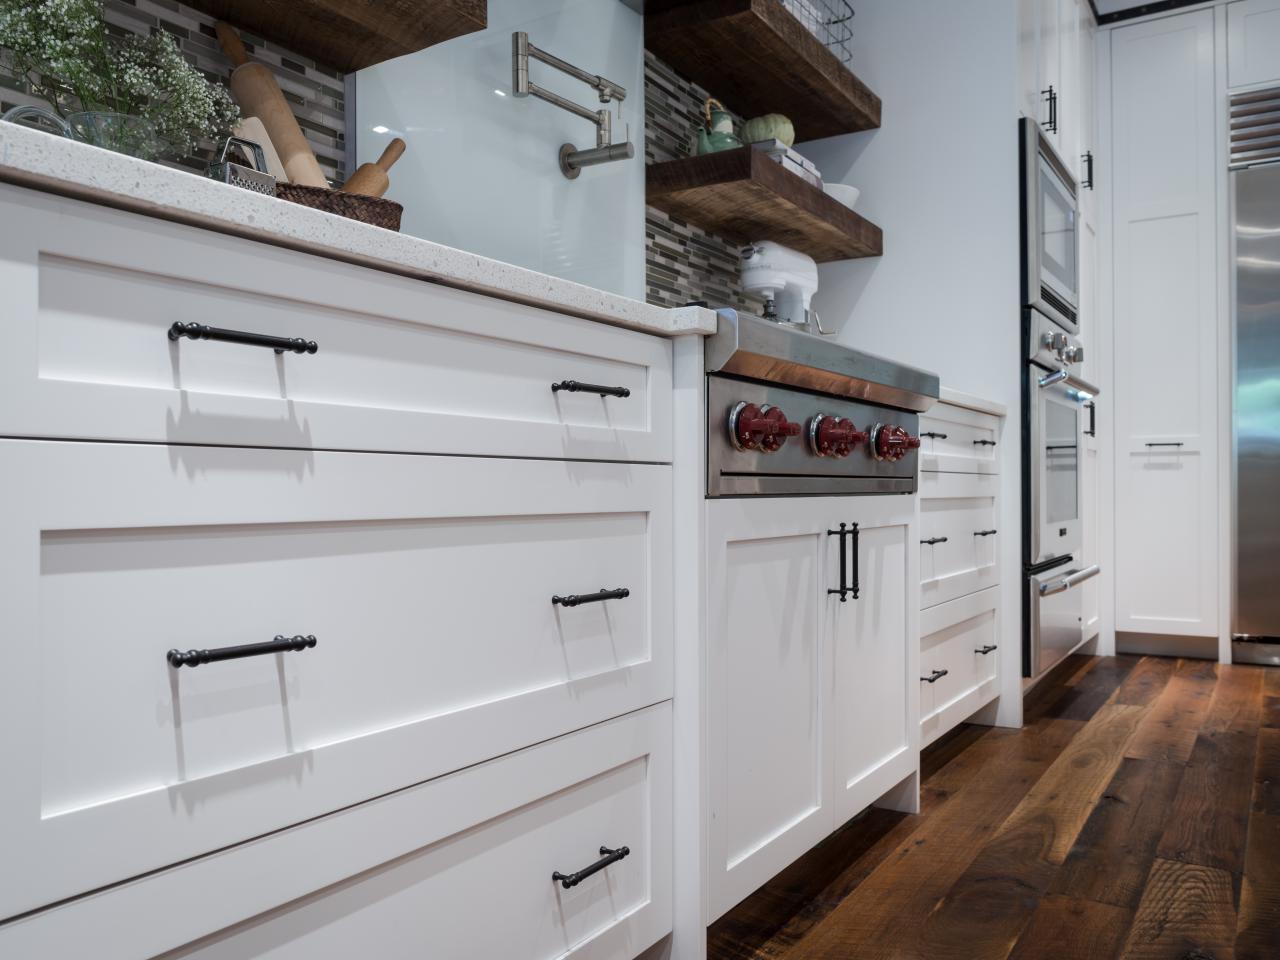 Dorable Kitchen Cabinets Quebec Crest - Kitchen Cabinets | Ideas ...